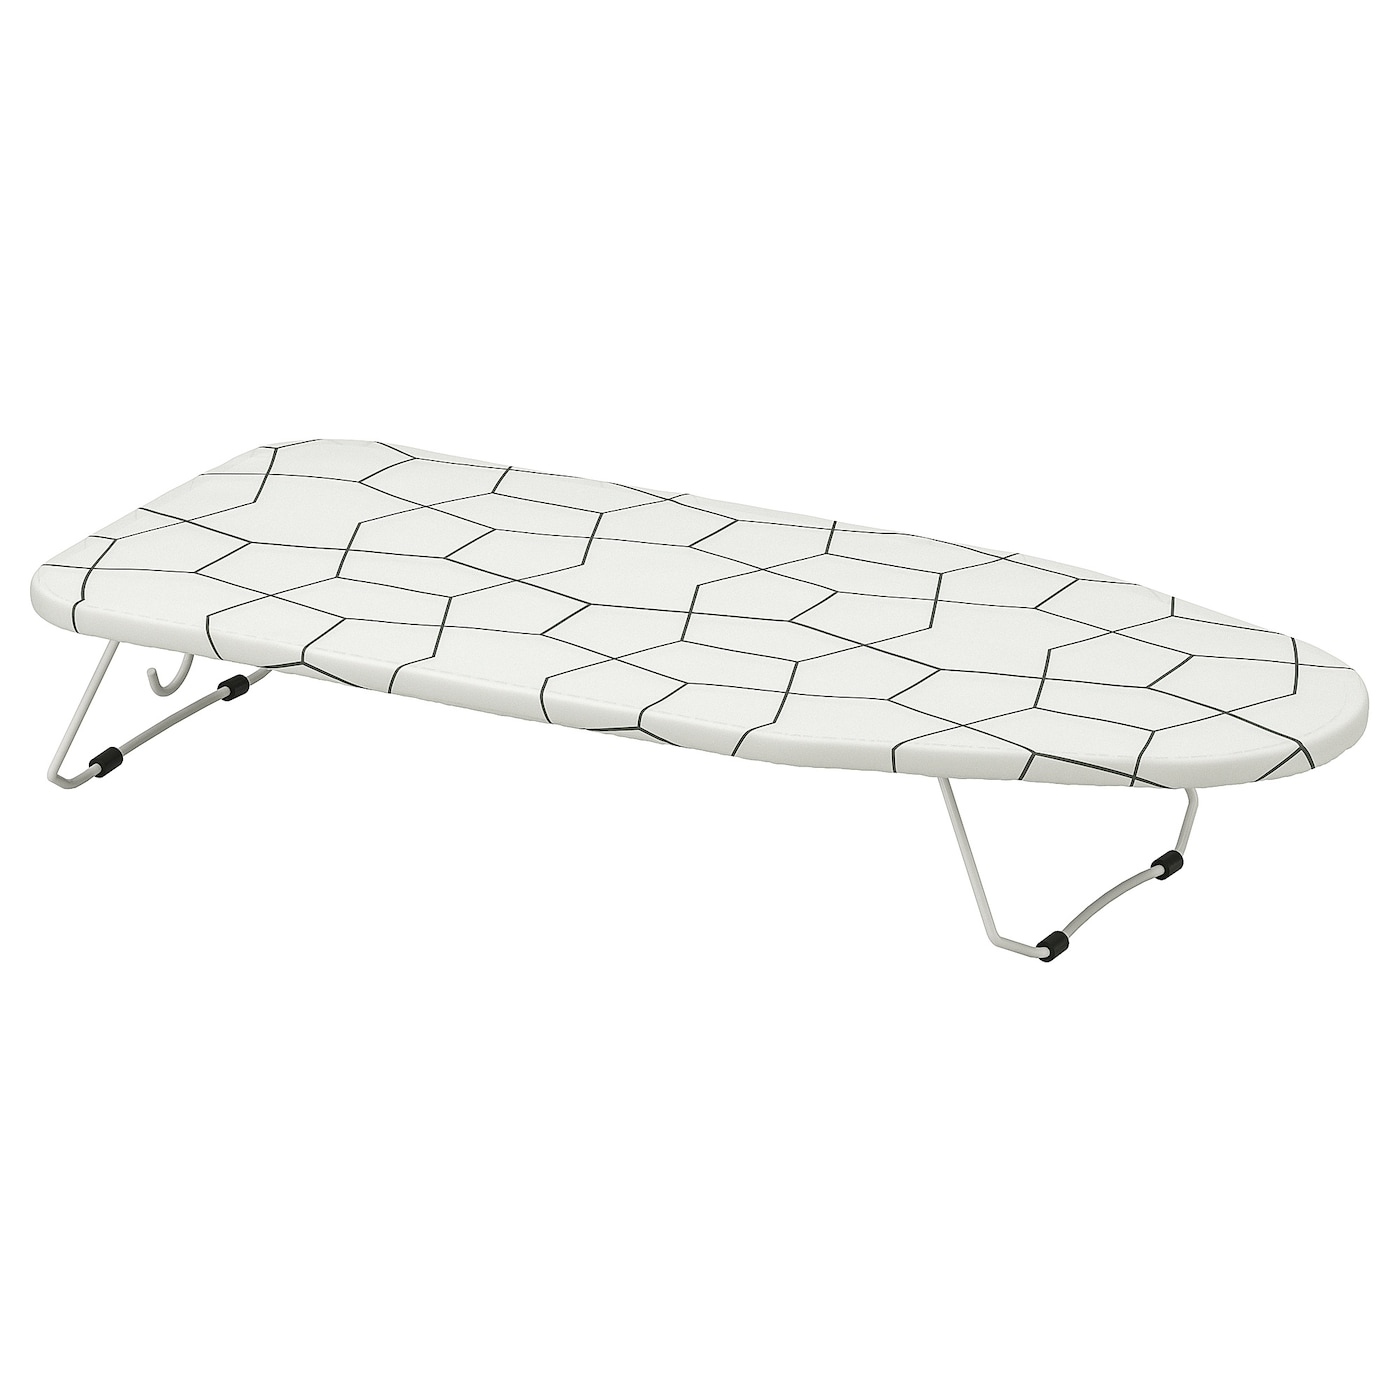 Jall Tabletop Ironing Board Ikea